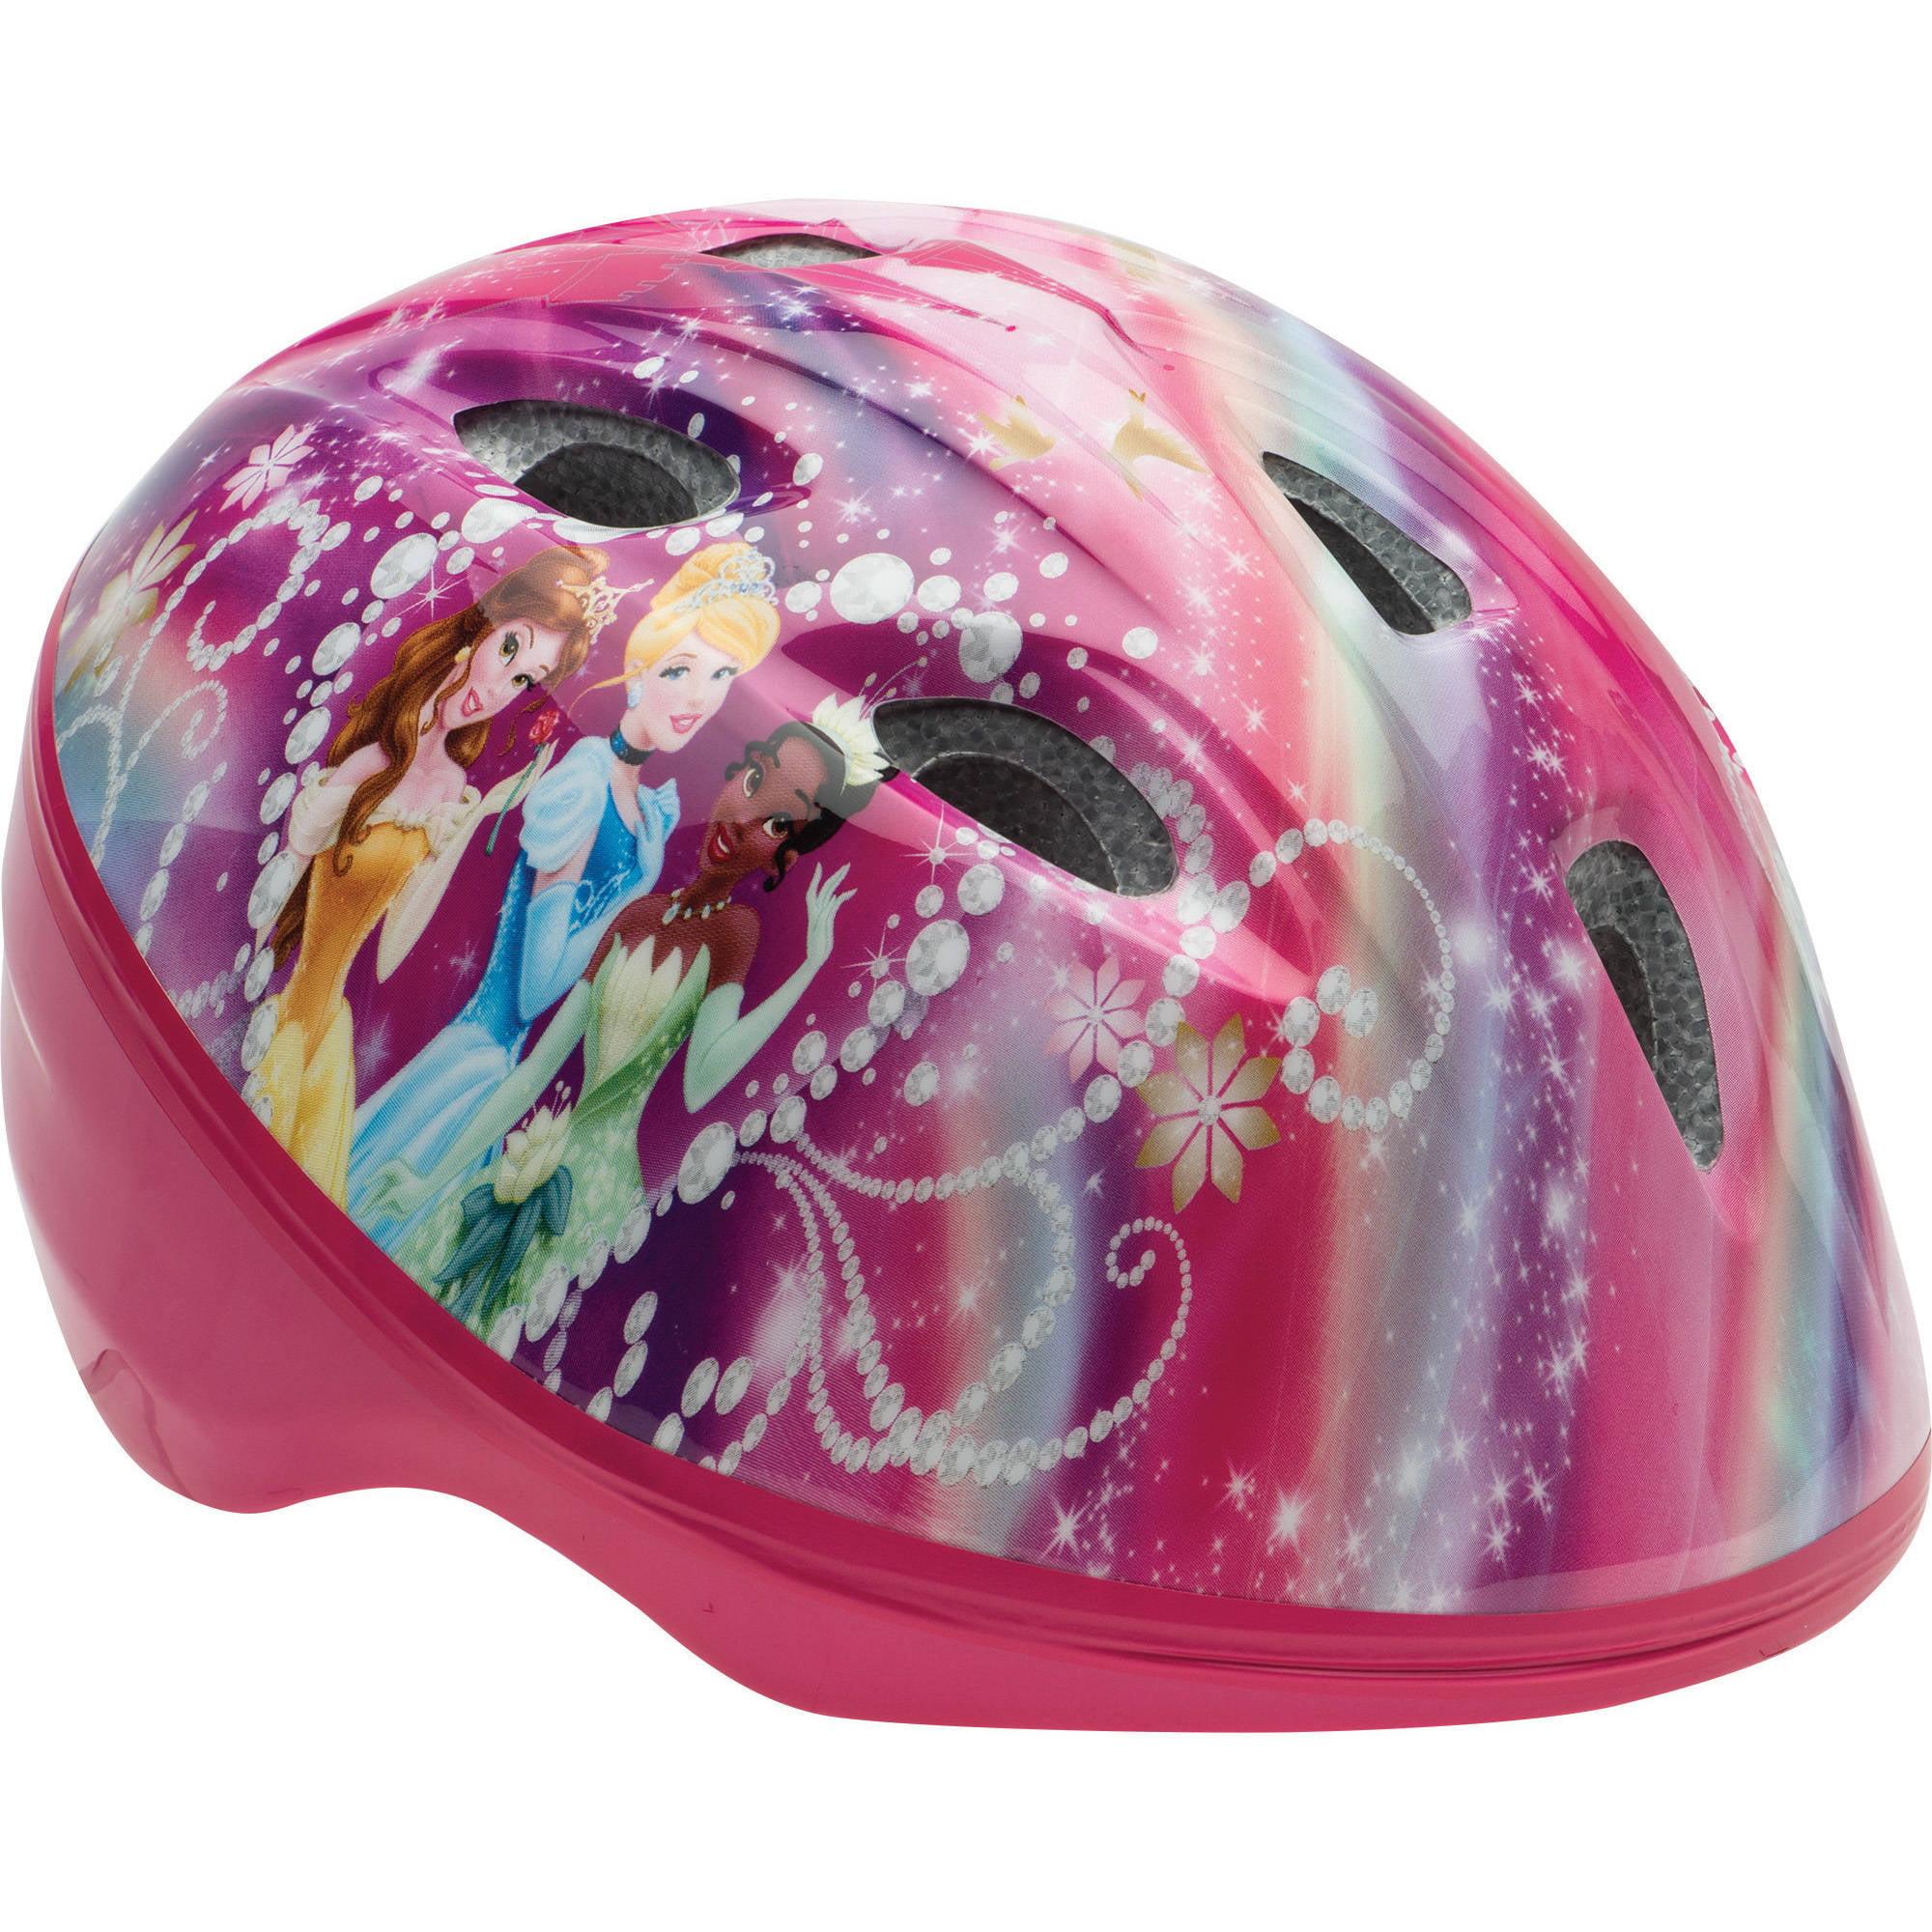 Bell Sports Princess Toddler Helmet